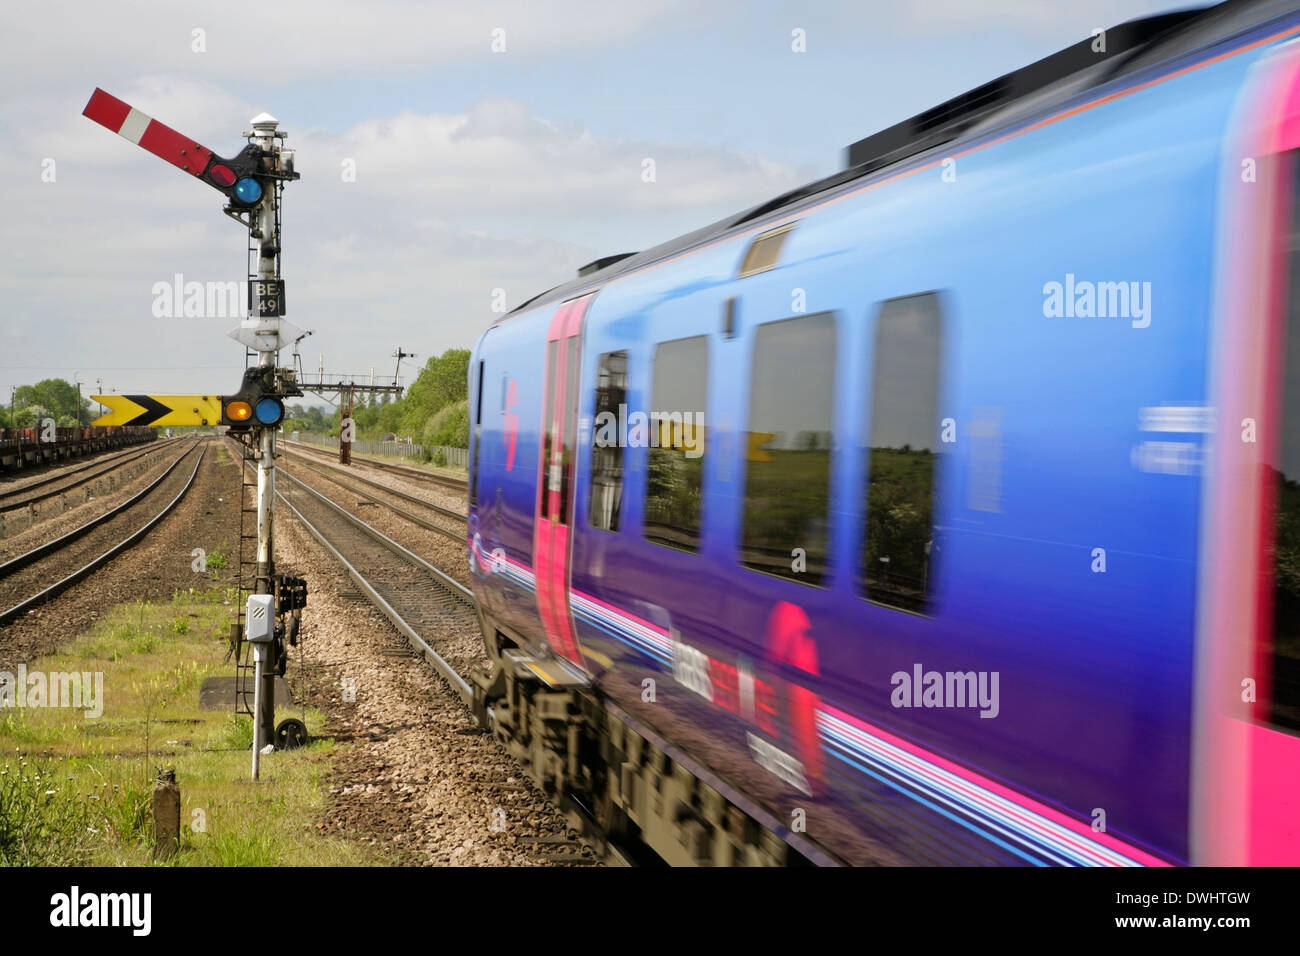 First Transpennine Trains Class 185 diesel multiple unit train leaving Barnetby railway station. Stock Photo